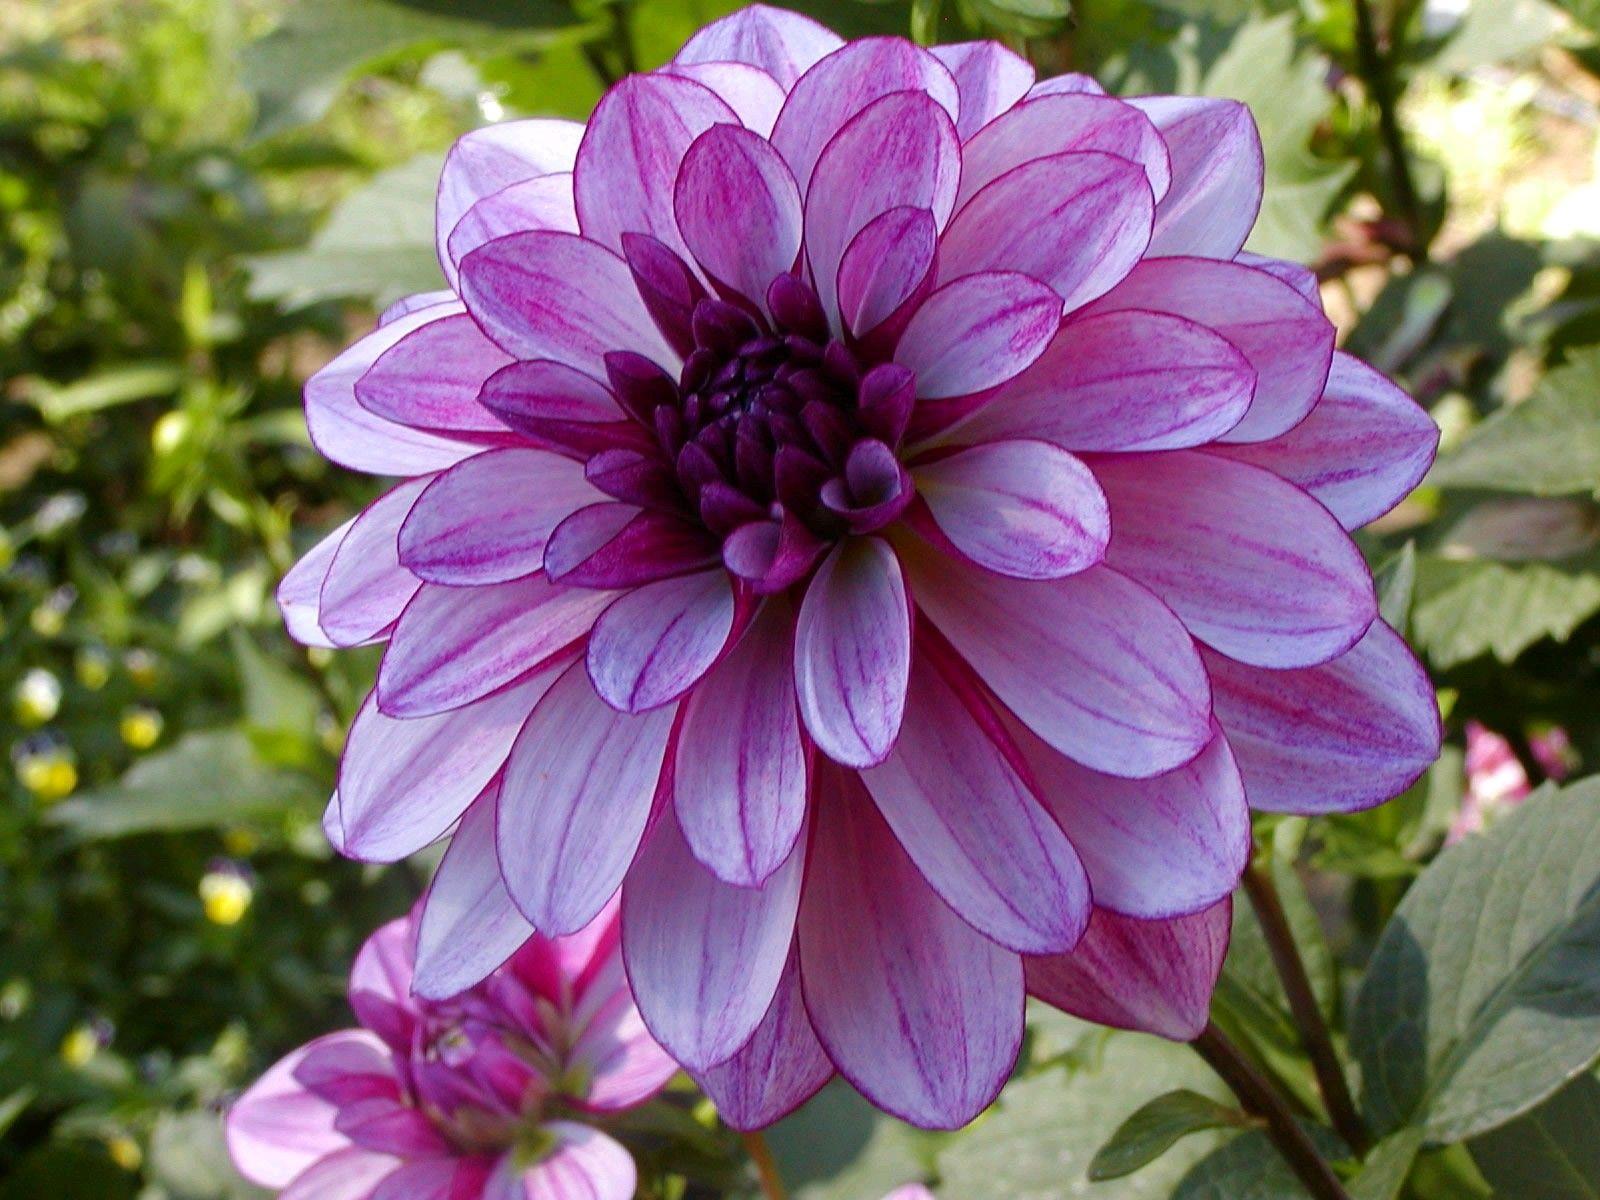 Dahlias Are A Type Of Tuberous Perennial Most Beautiful Flowers Dahlia Flower Purple Dahlia